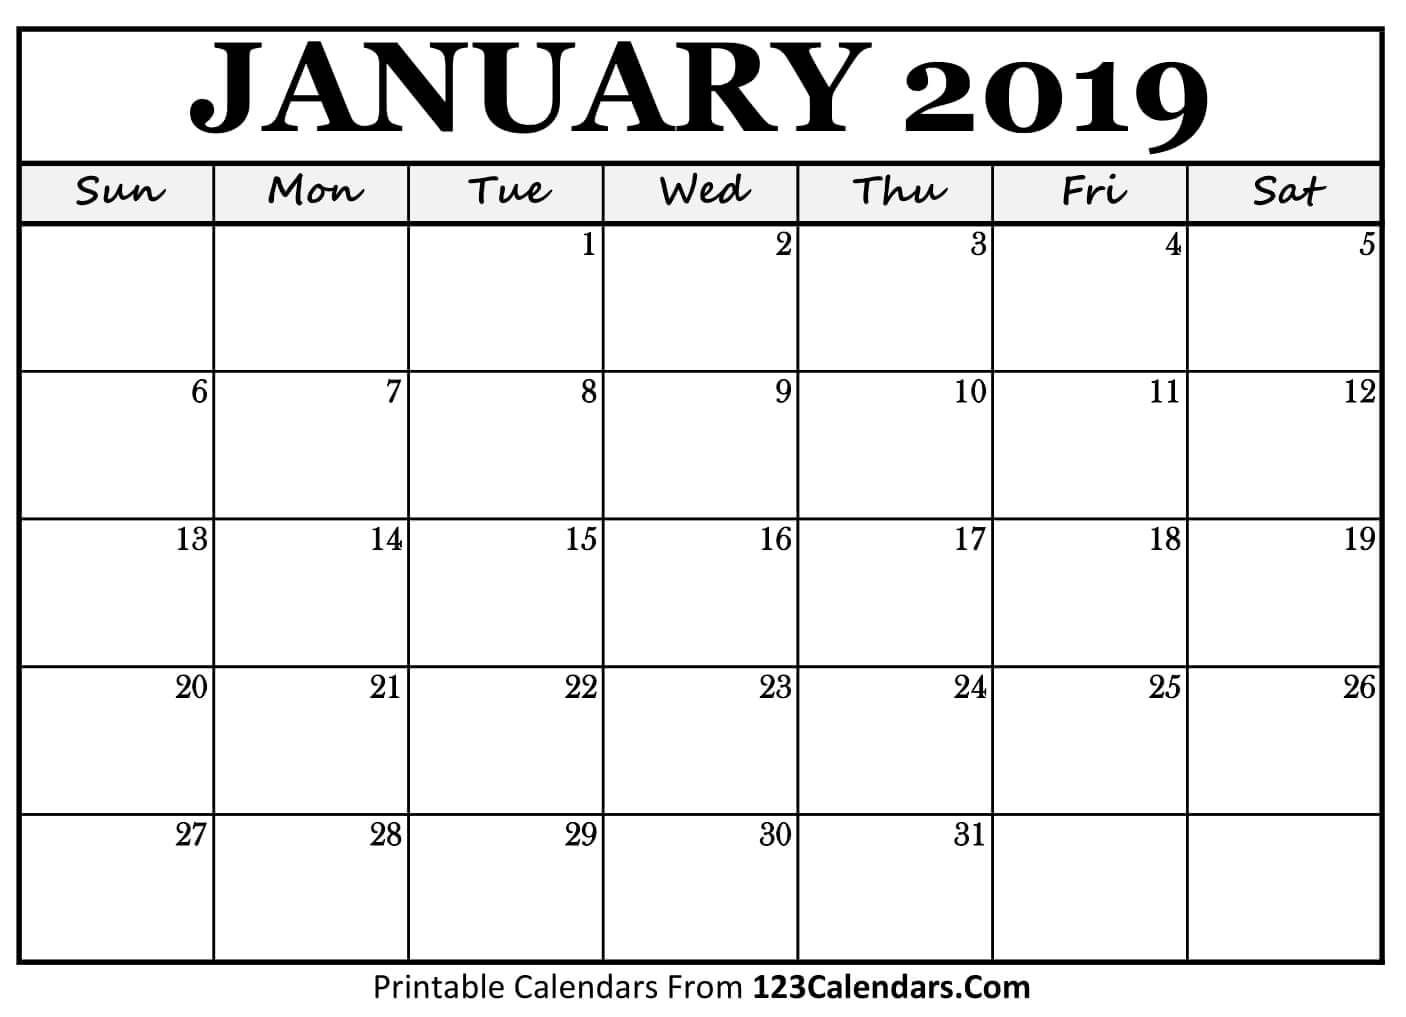 calendar template january 2019